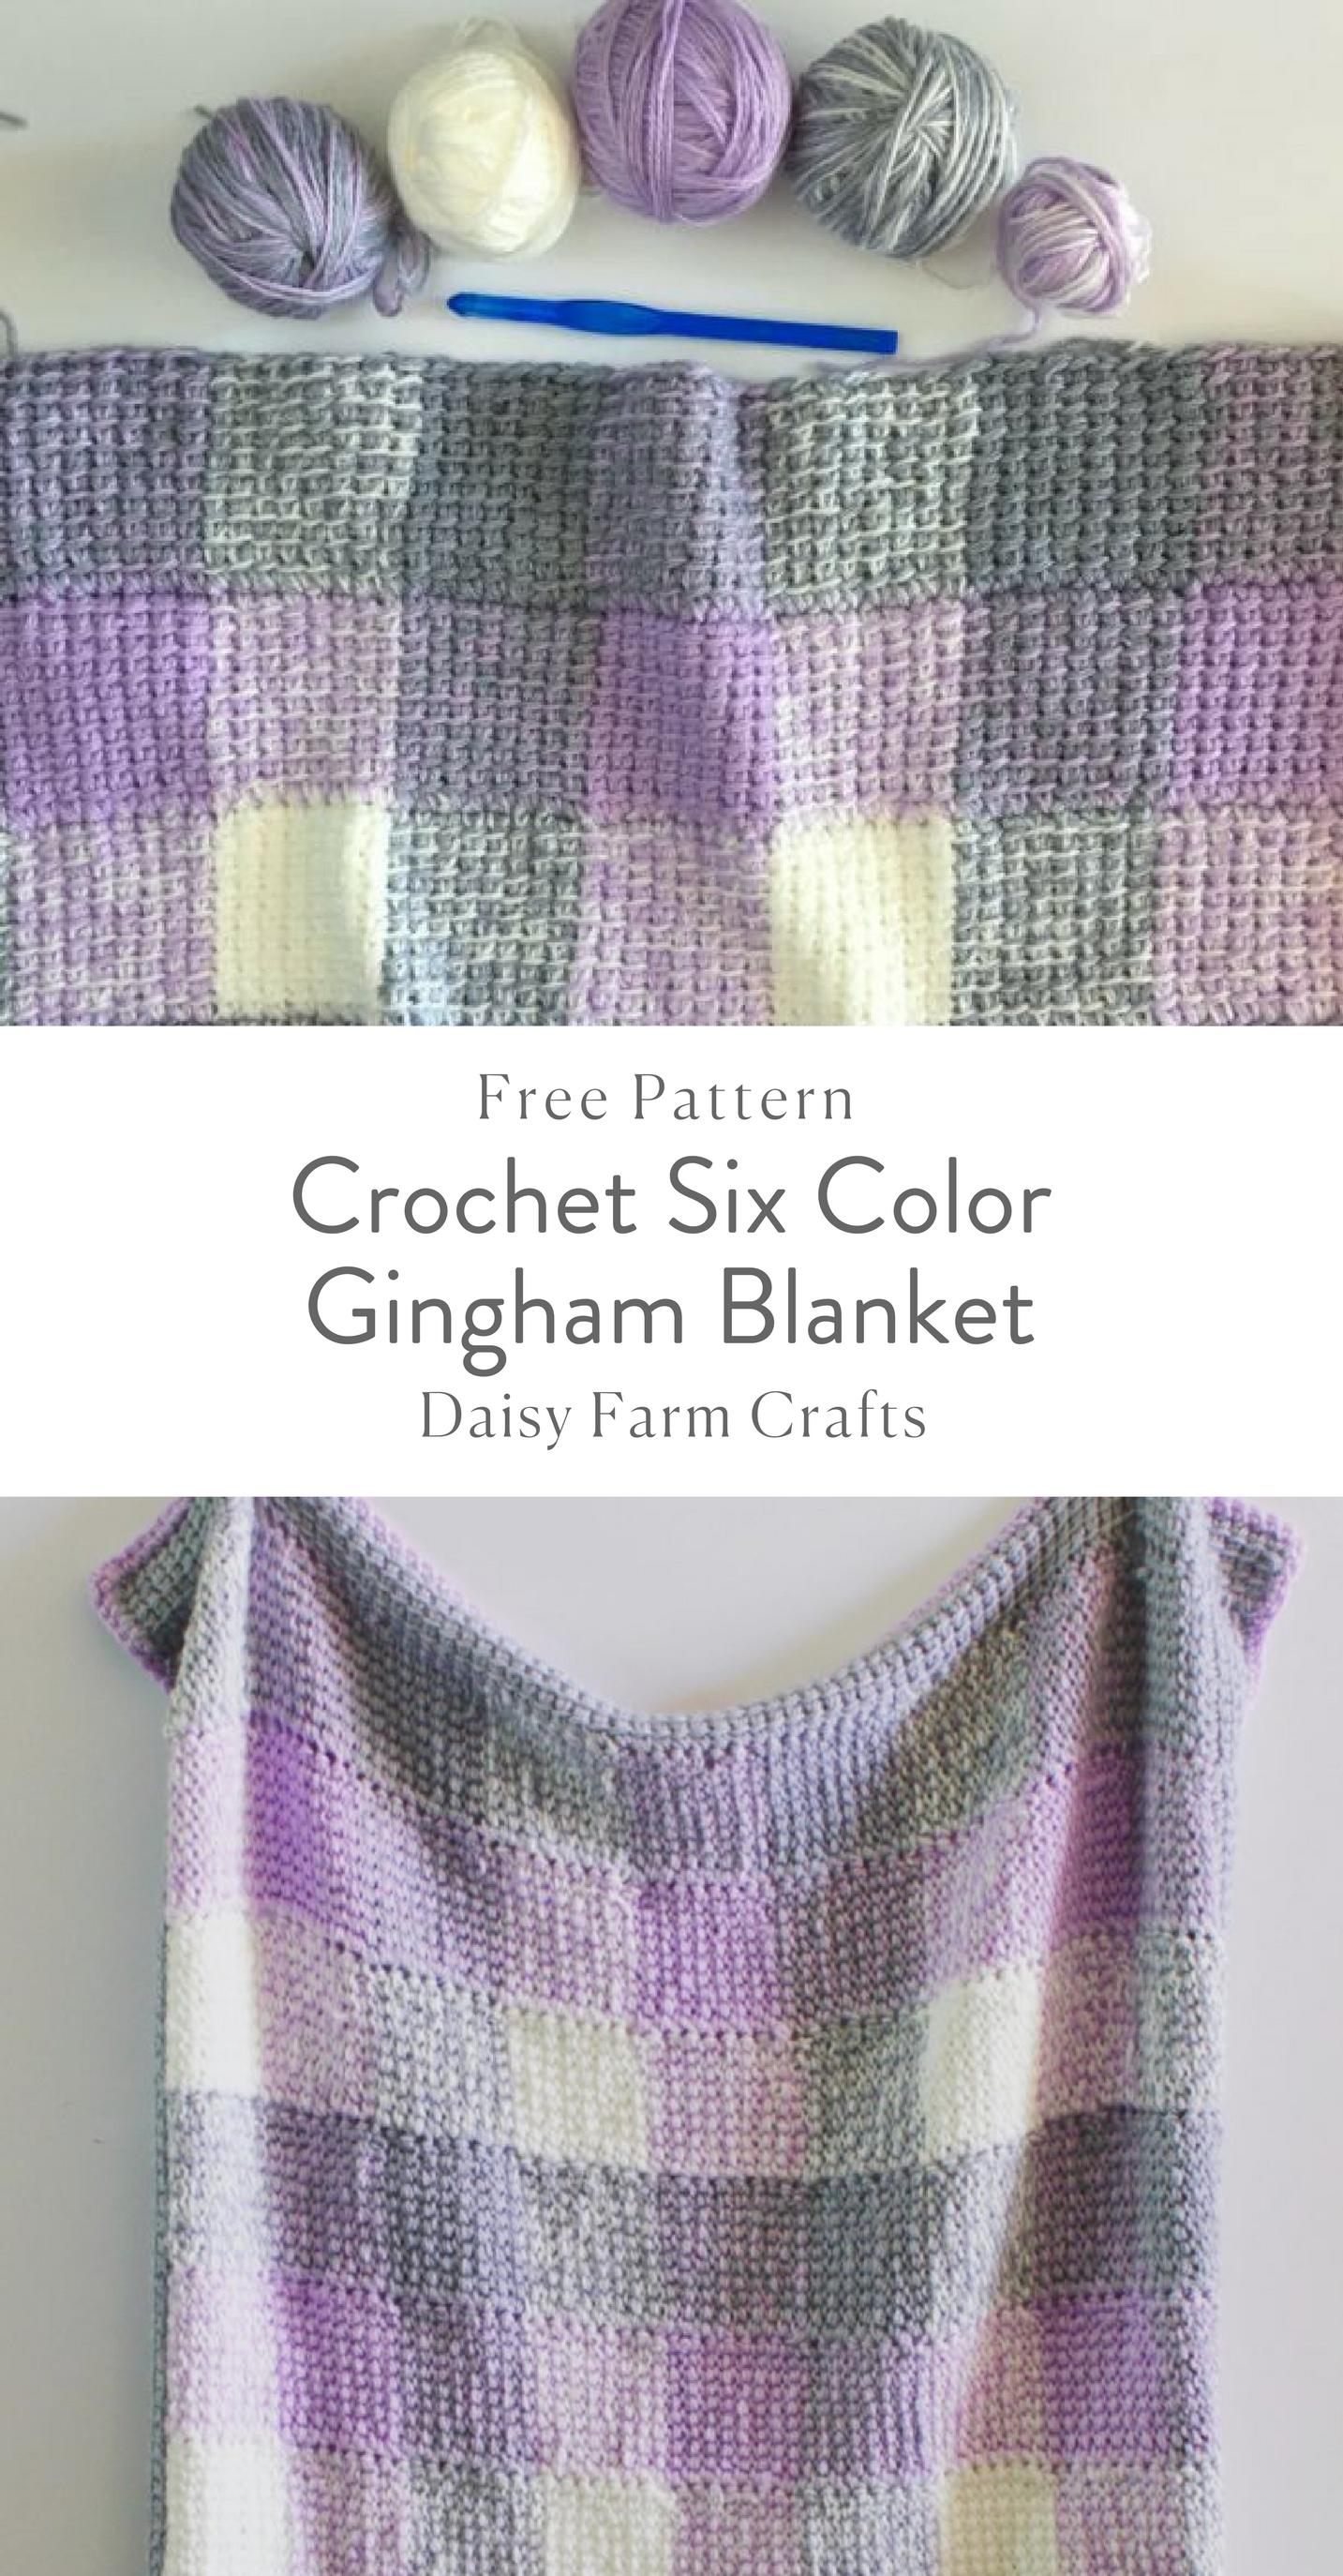 Free Pattern - Crochet Six Color Gingham Blanket | Crochet patterns ...